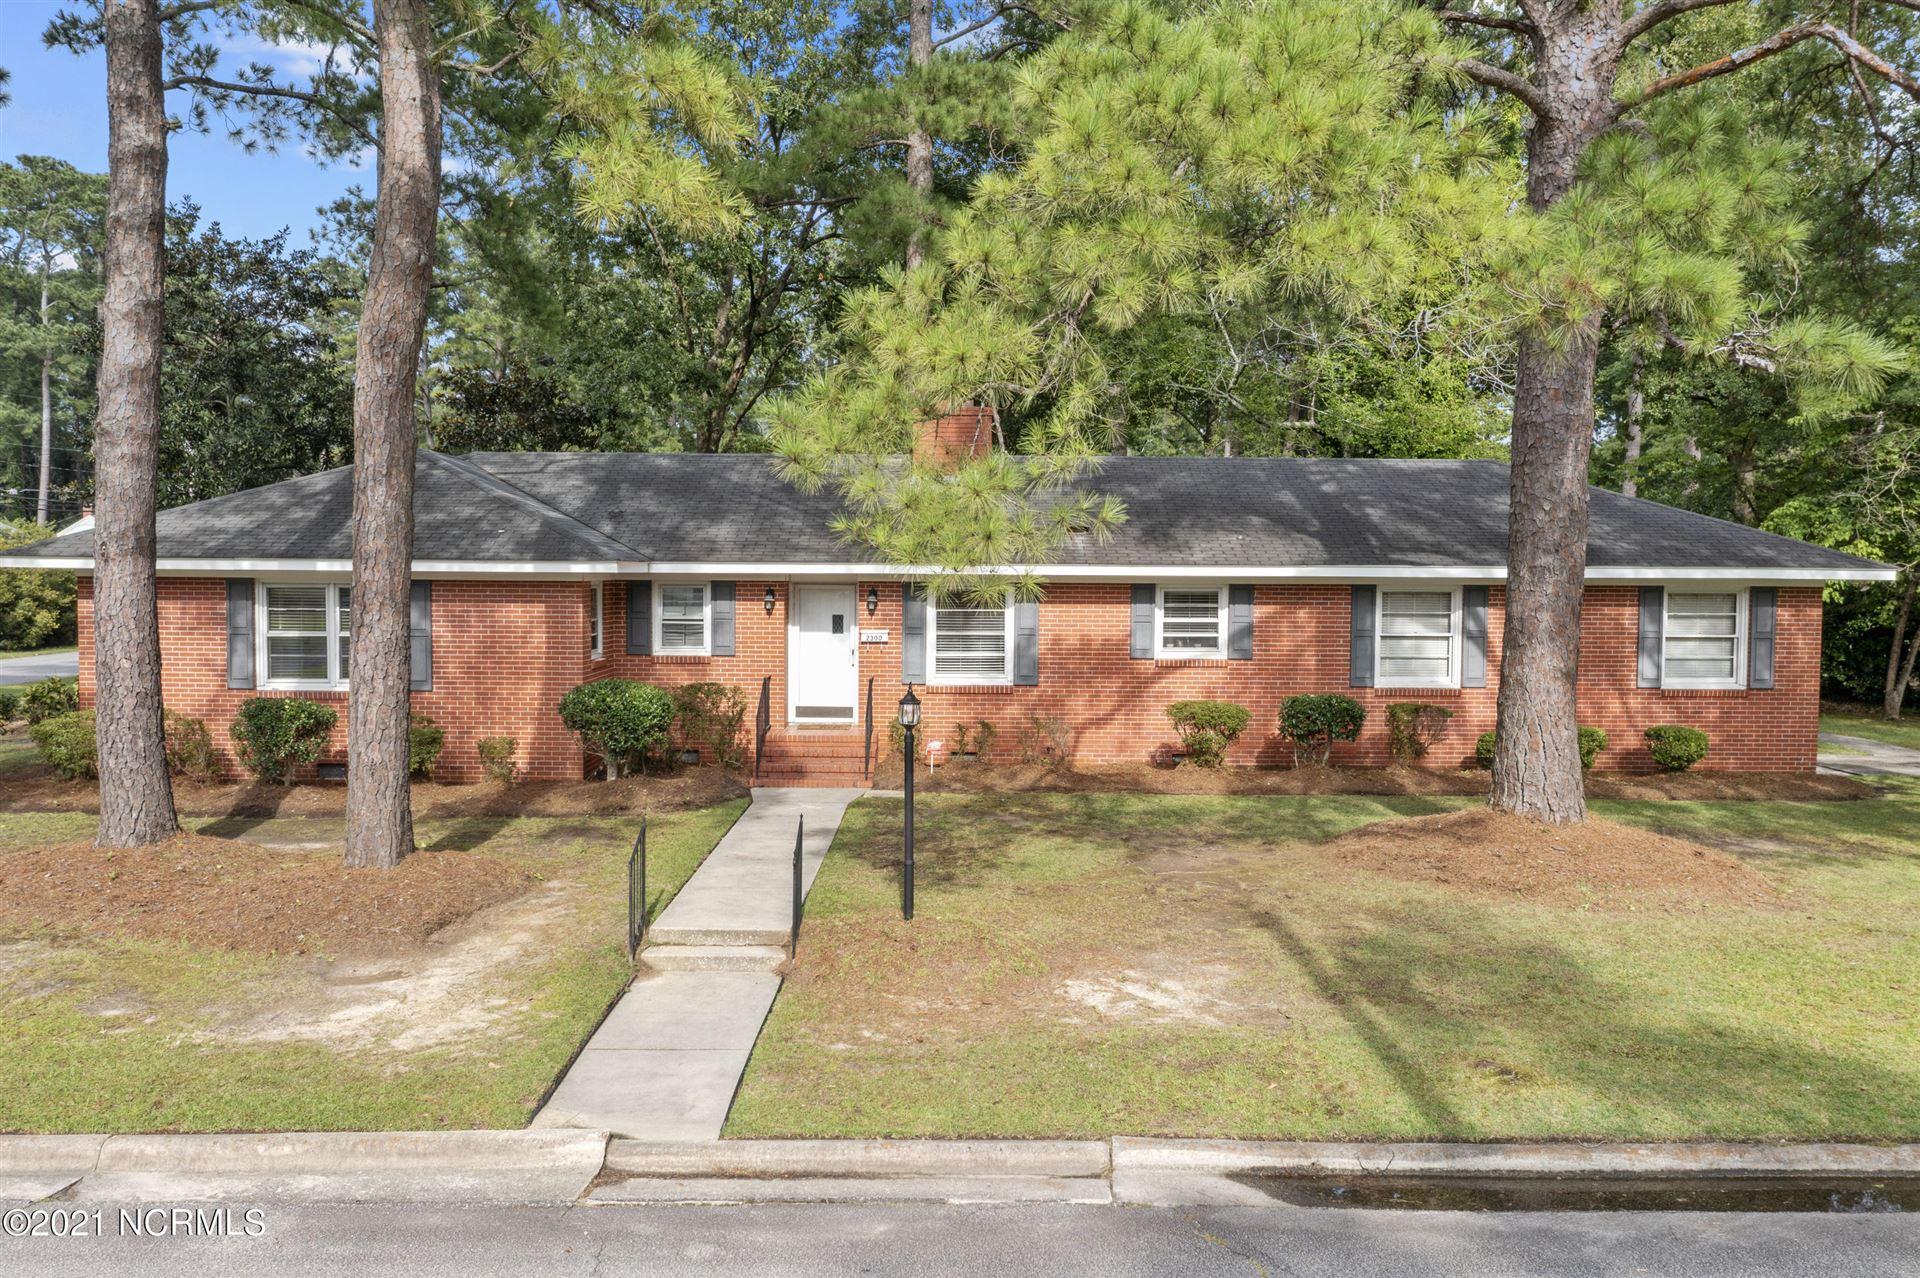 Photo of 2300 N Mcmillan Avenue, Lumberton, NC 28358 (MLS # 100285030)